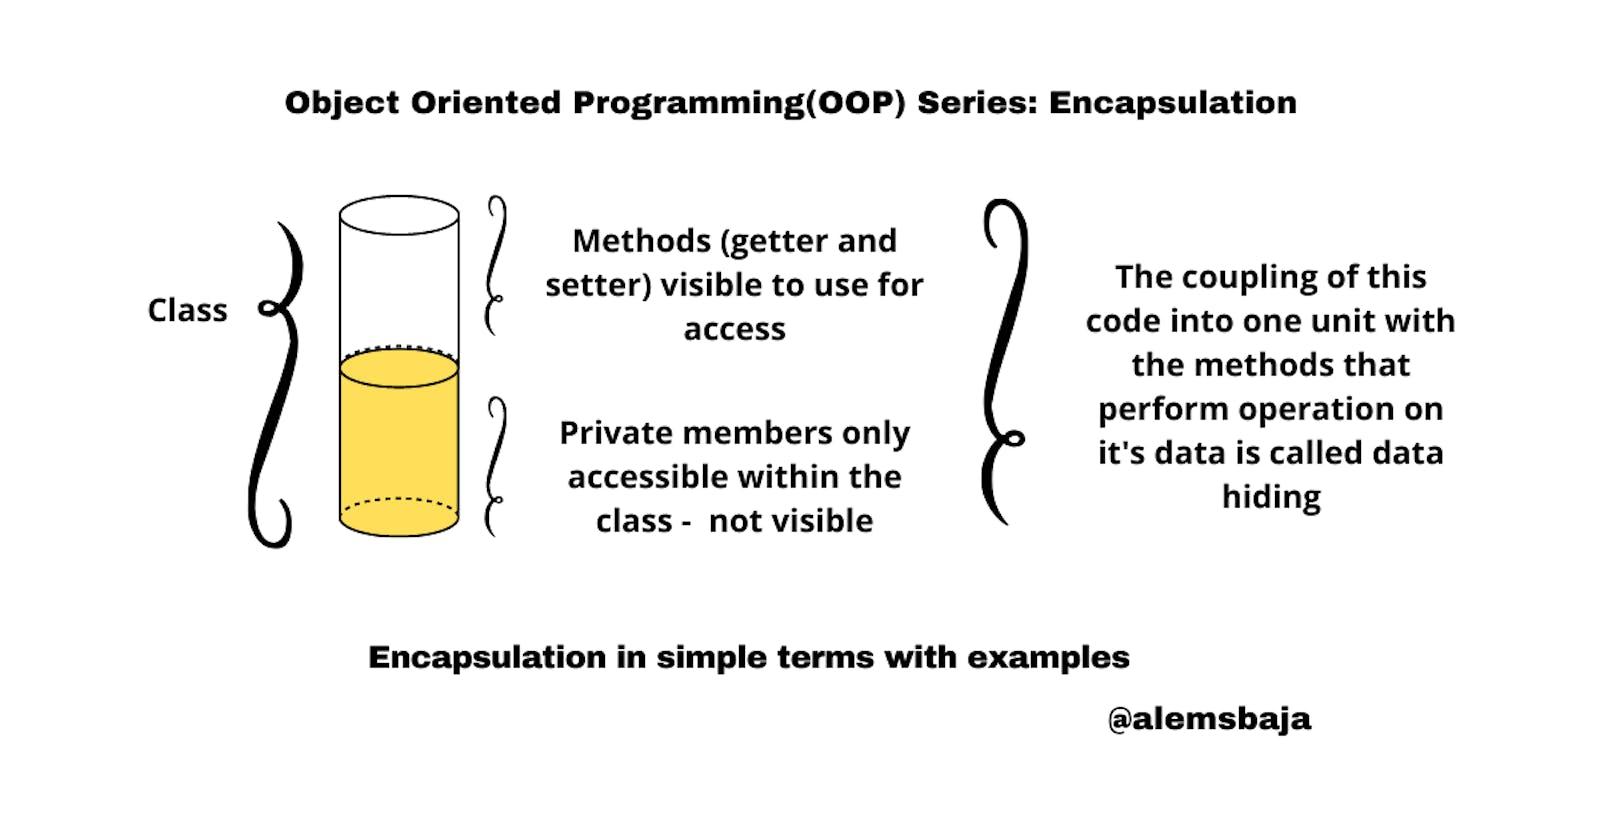 Object Oriented Programming(OOP) Series: Encapsulation